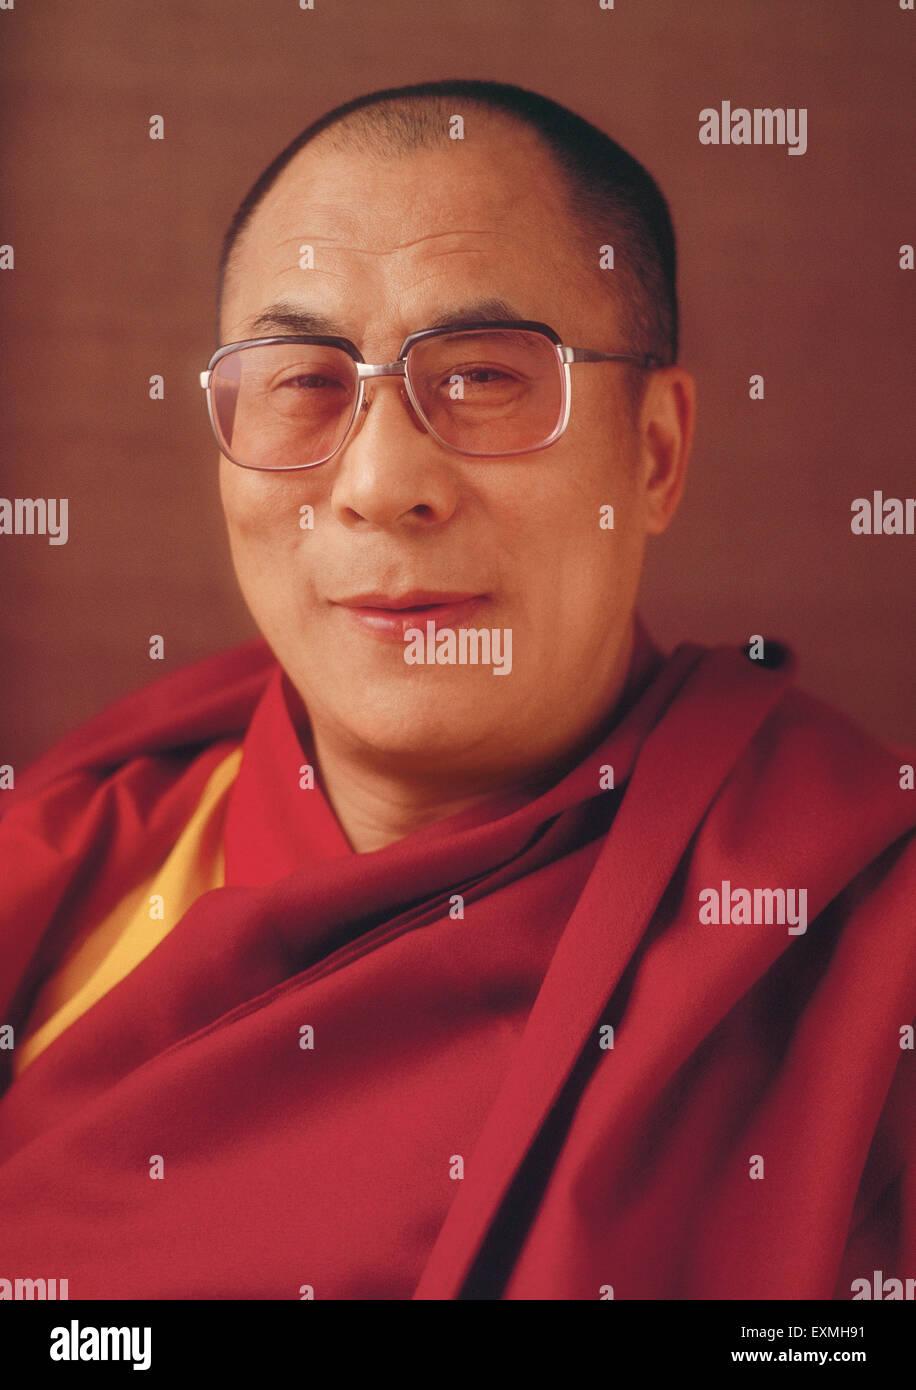 Portrait of Dalai Lama NO MR - Stock Image